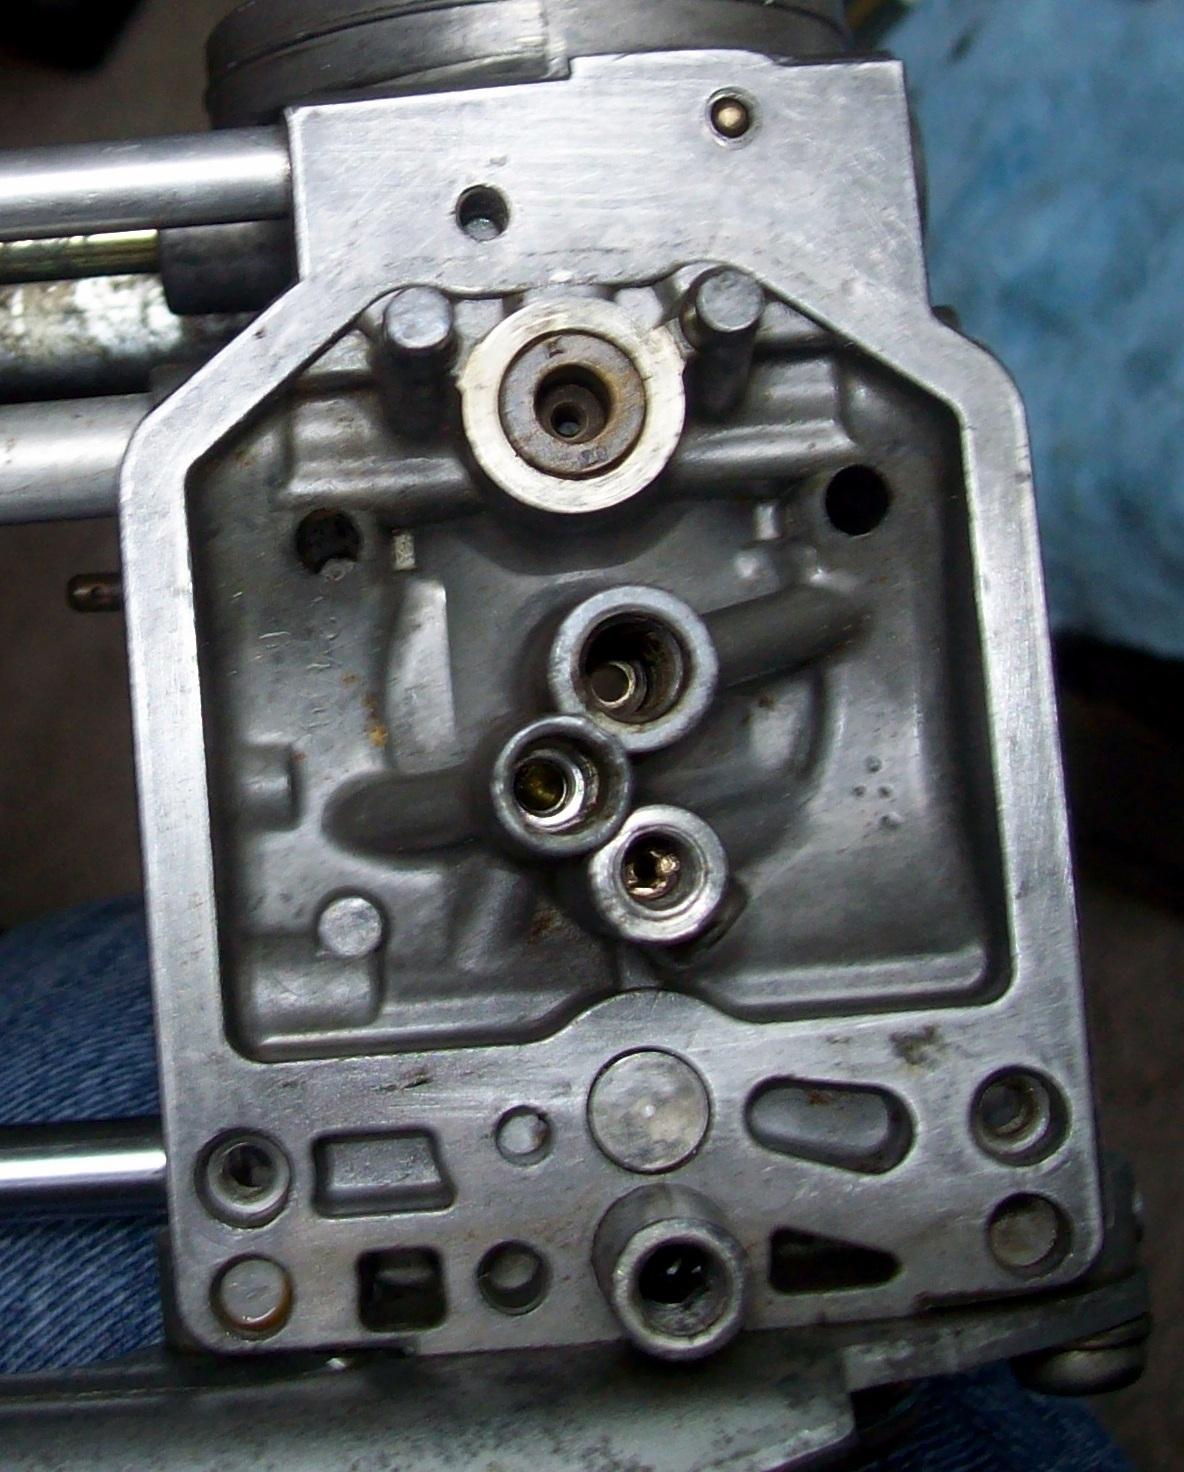 Rebuilding VB Carbs-201_4693-001.jpg